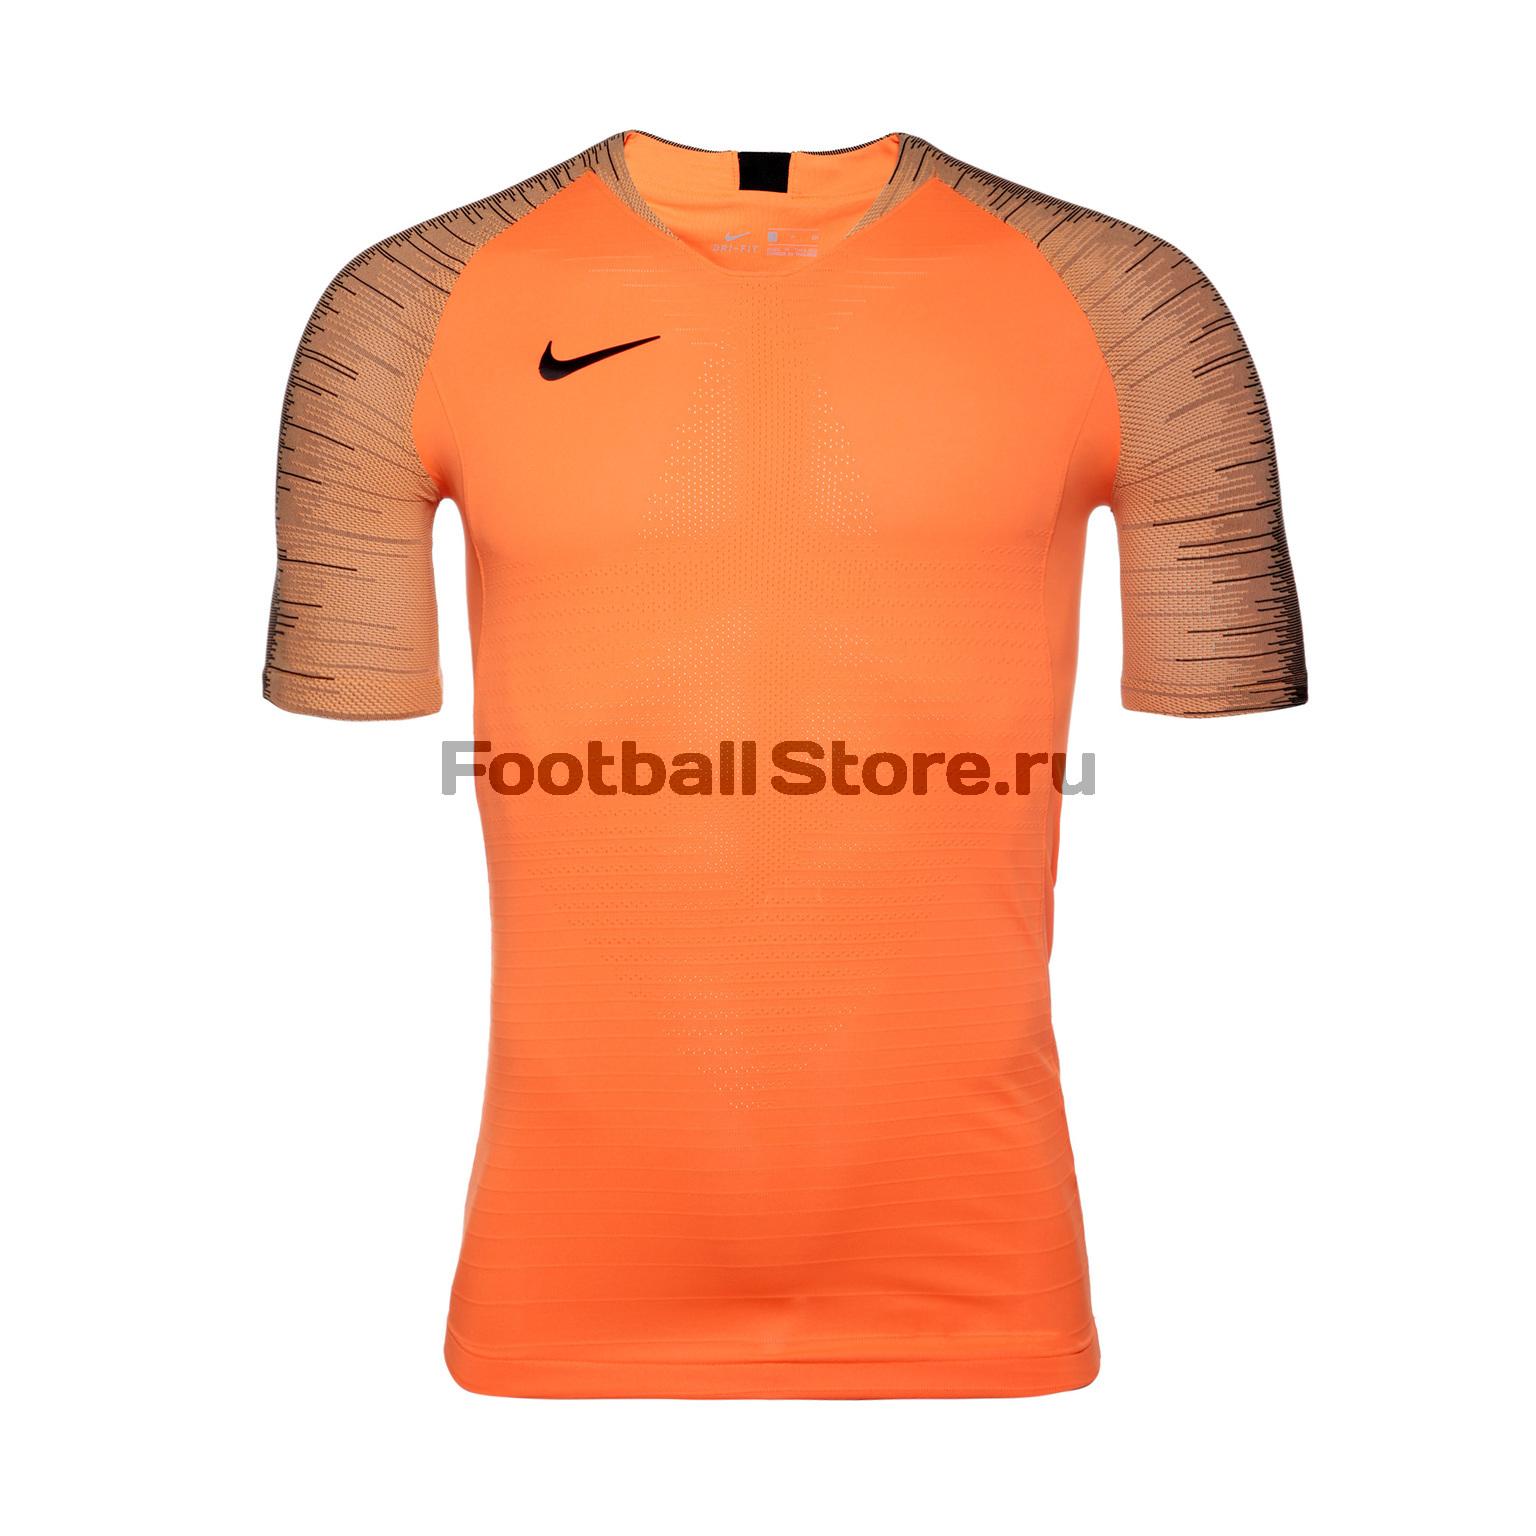 Футболка Nike Mercurial Vapor 892887-806 бутсы nike mercurial victory iii fg 509128 800